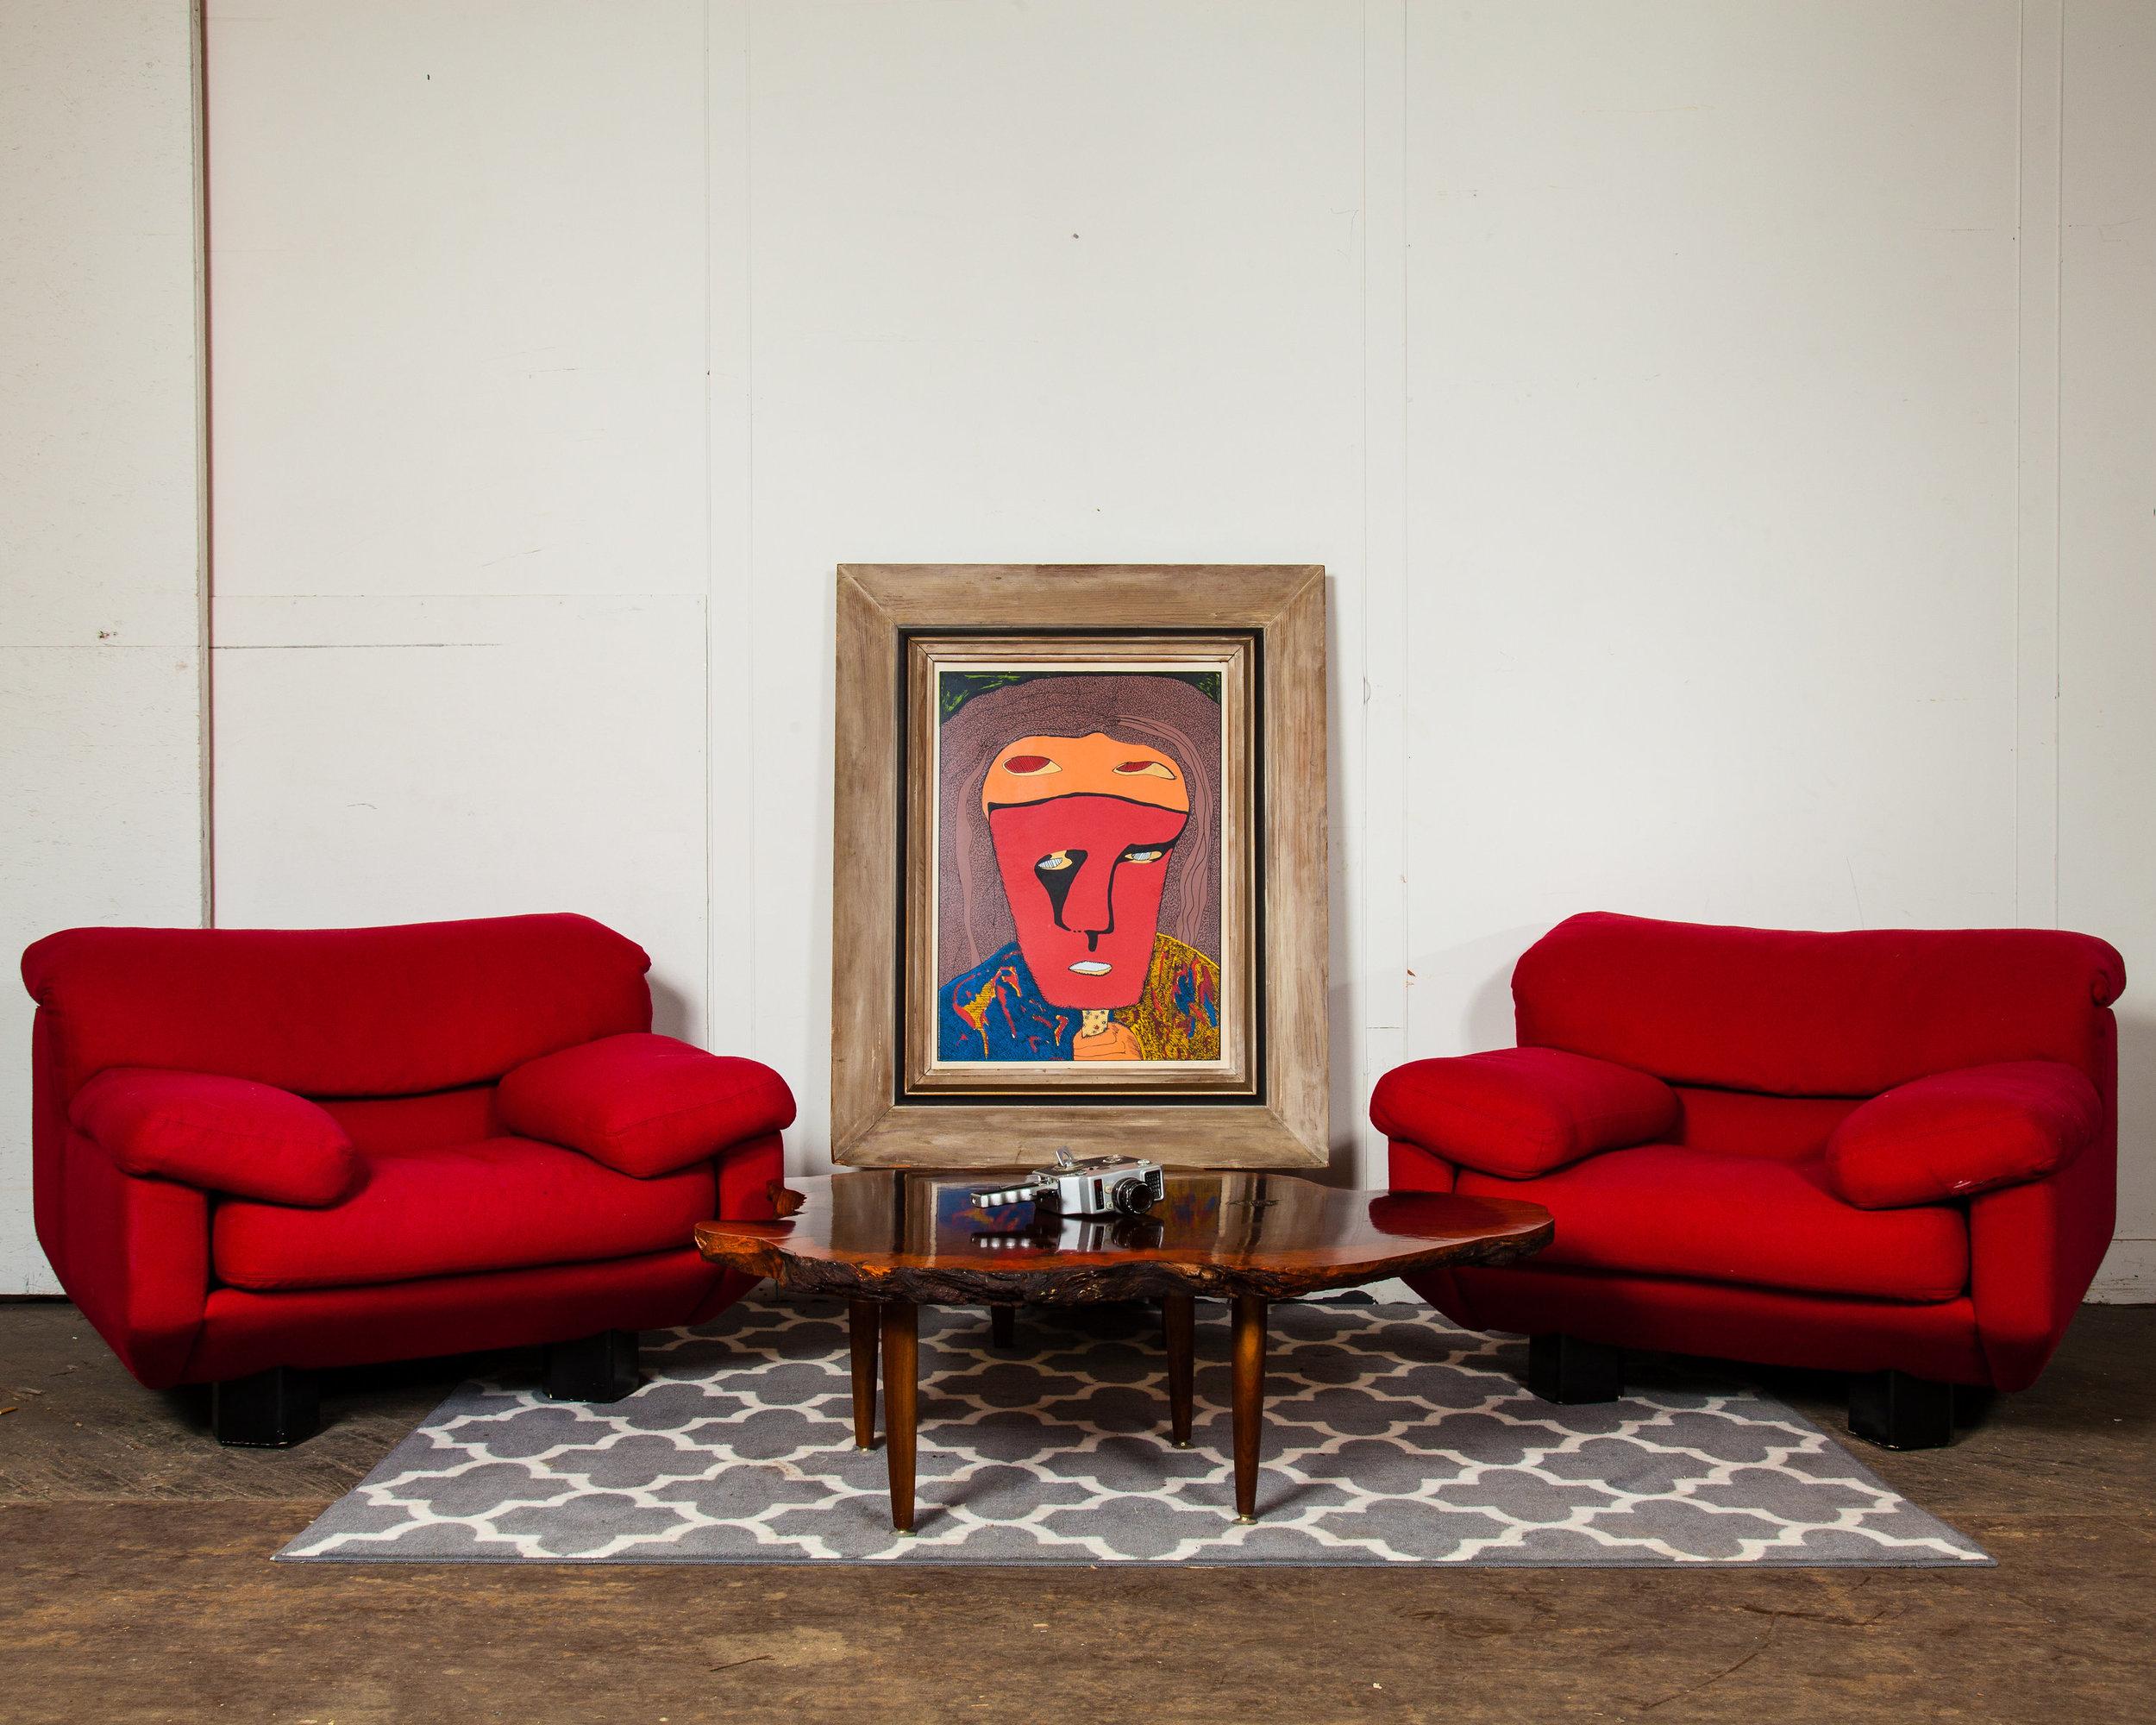 1990s Overstuffed Designer Chairs